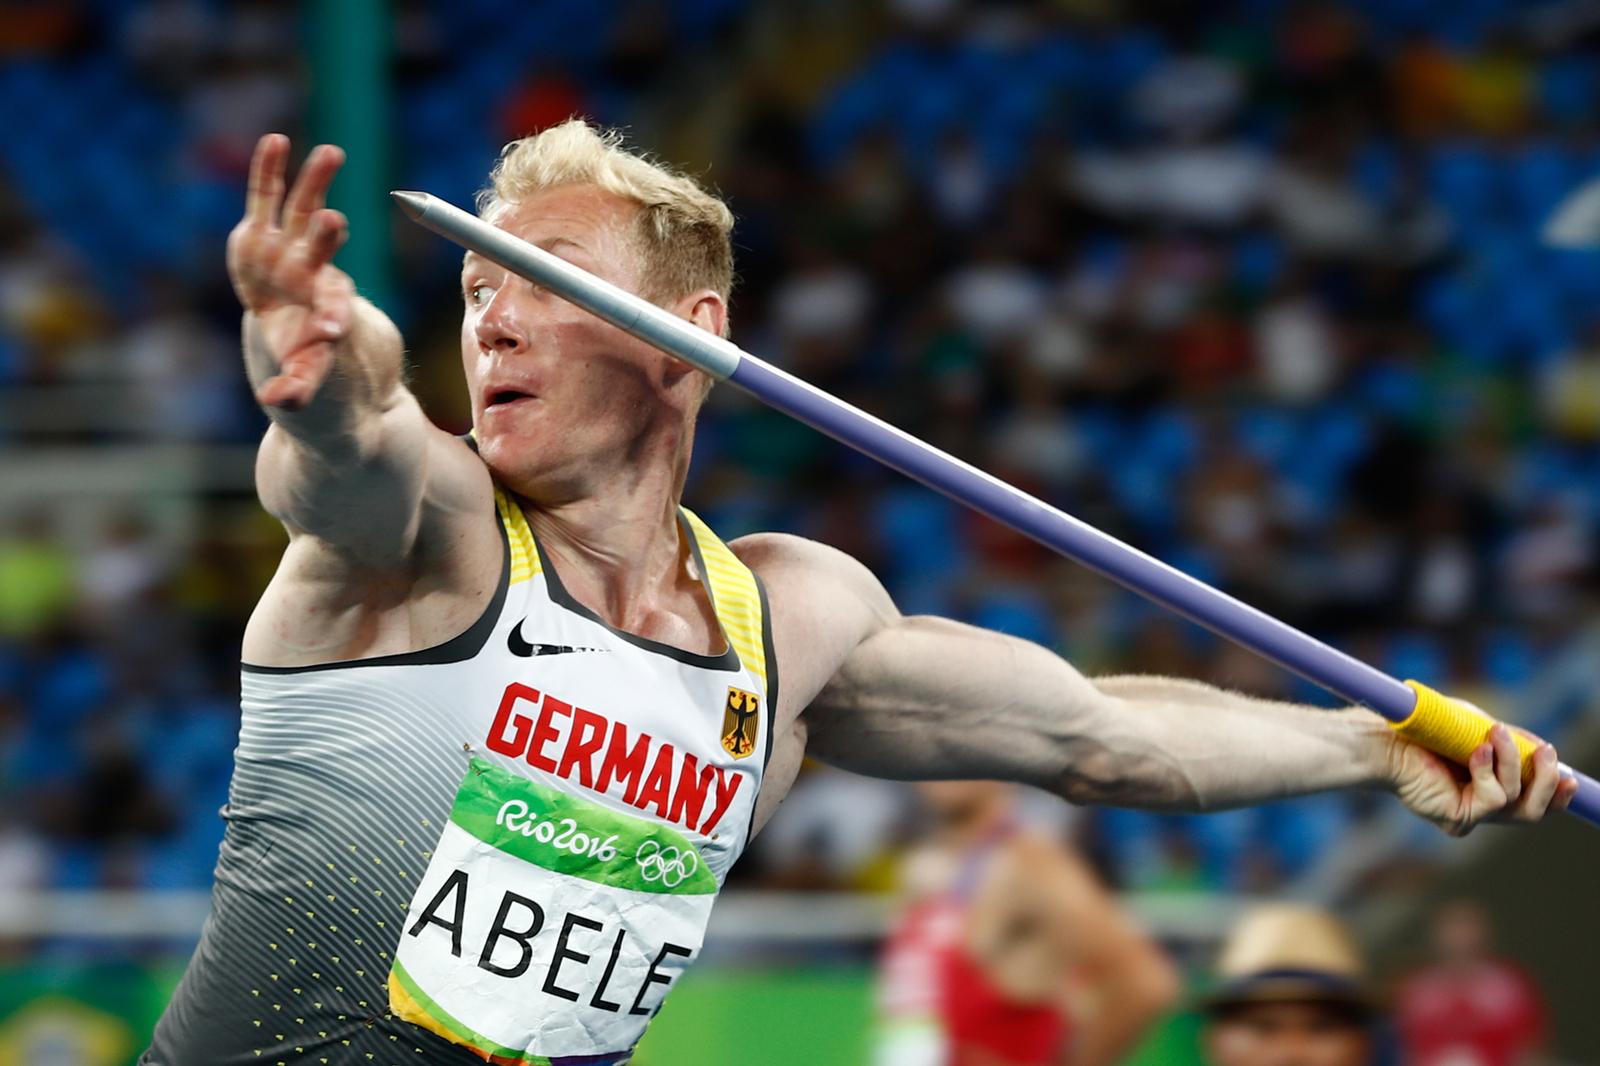 Немецкий атлет Артур Абель запускает копье